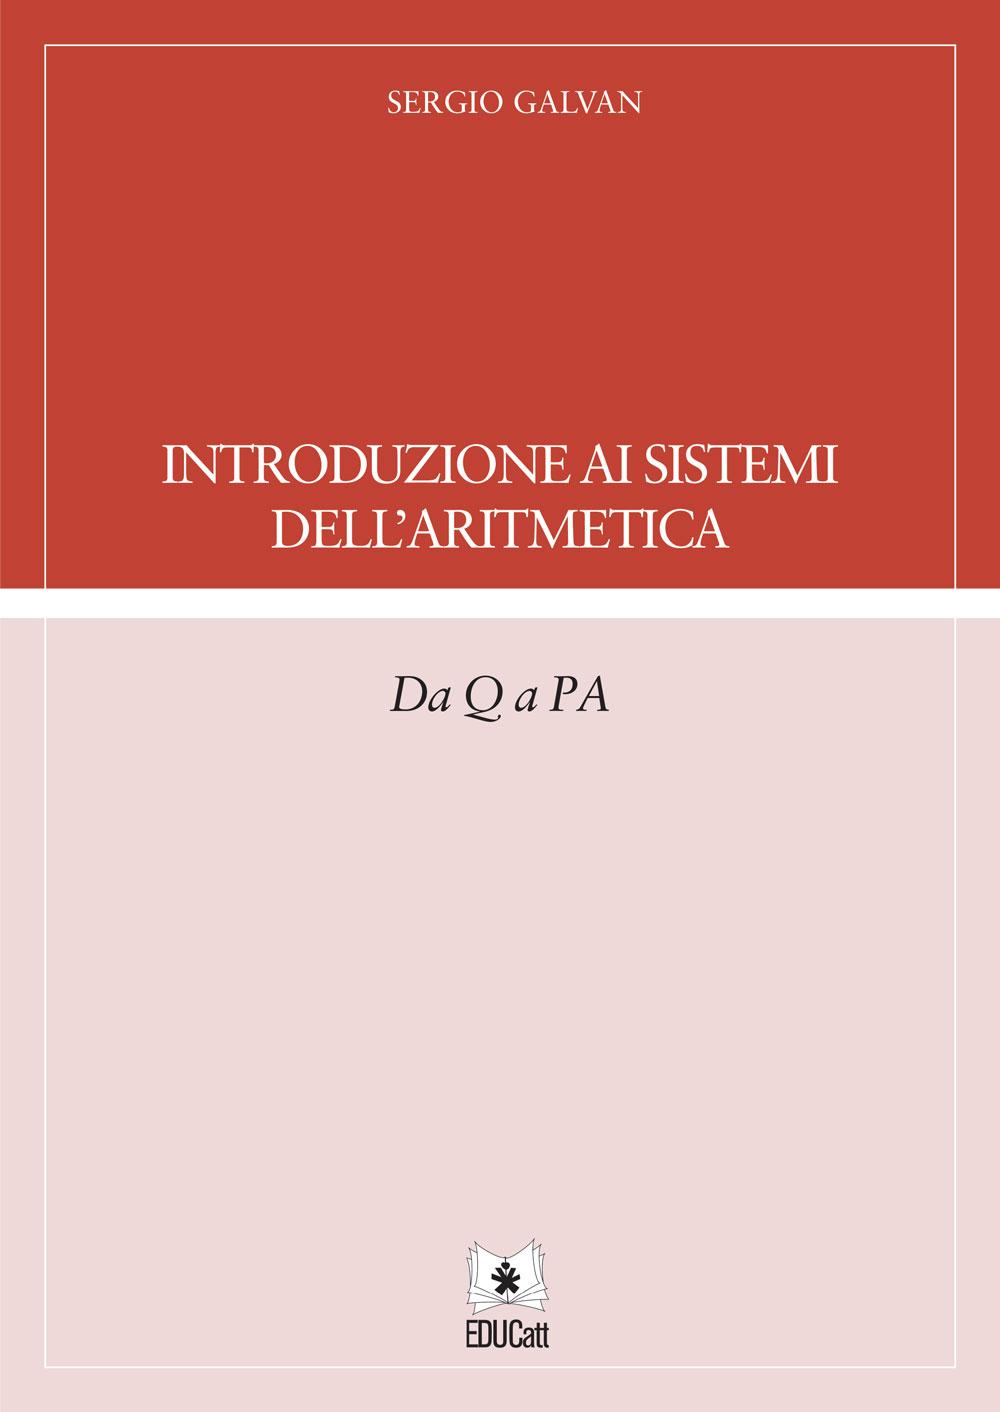 Introduzione ai sistemi dell'aritmetica. Da Q a PA